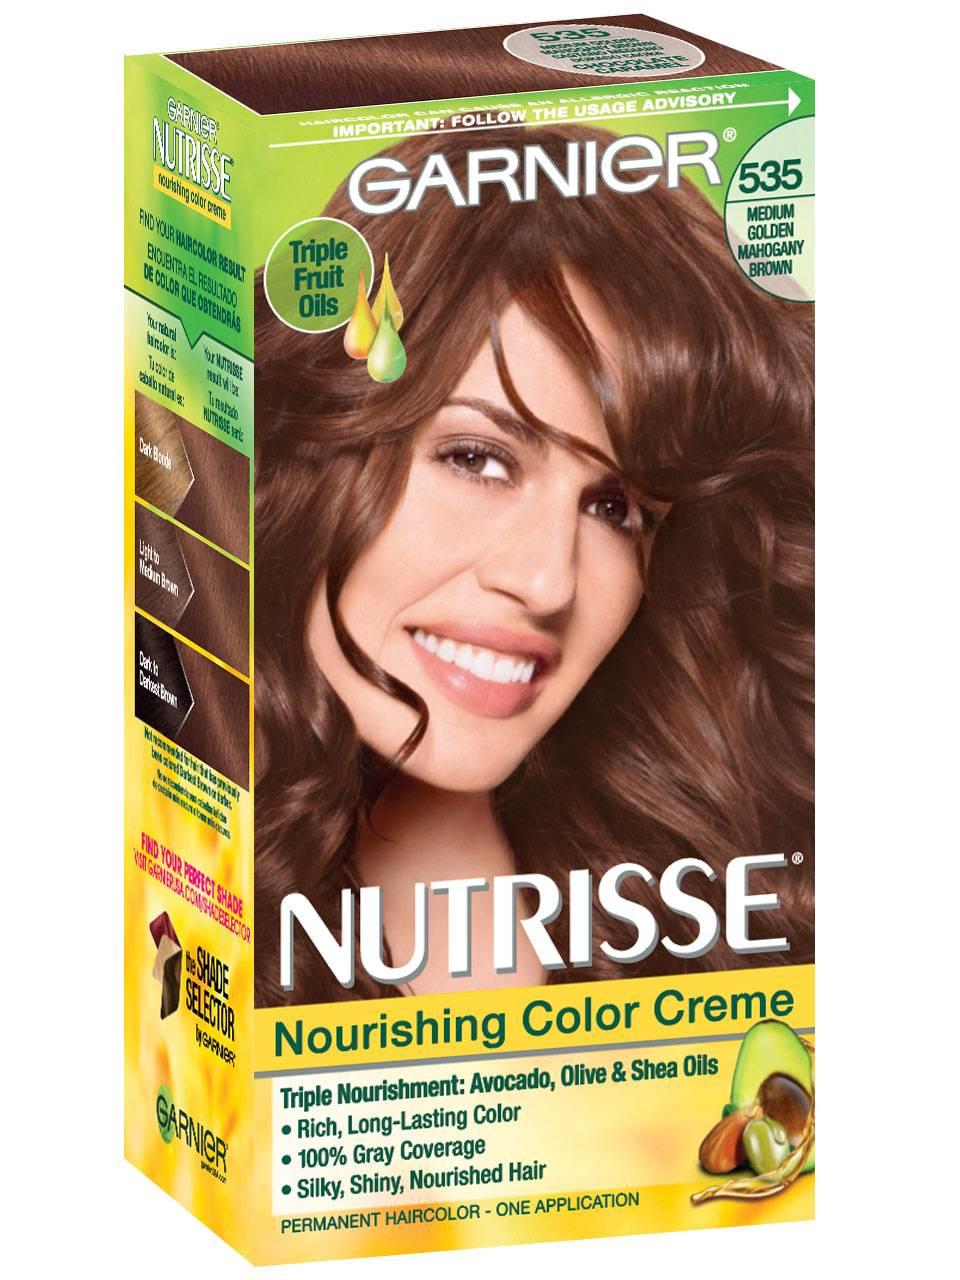 Nutrisse Nourishing Color Creme Golden Mahogany Brown 535 Garnier